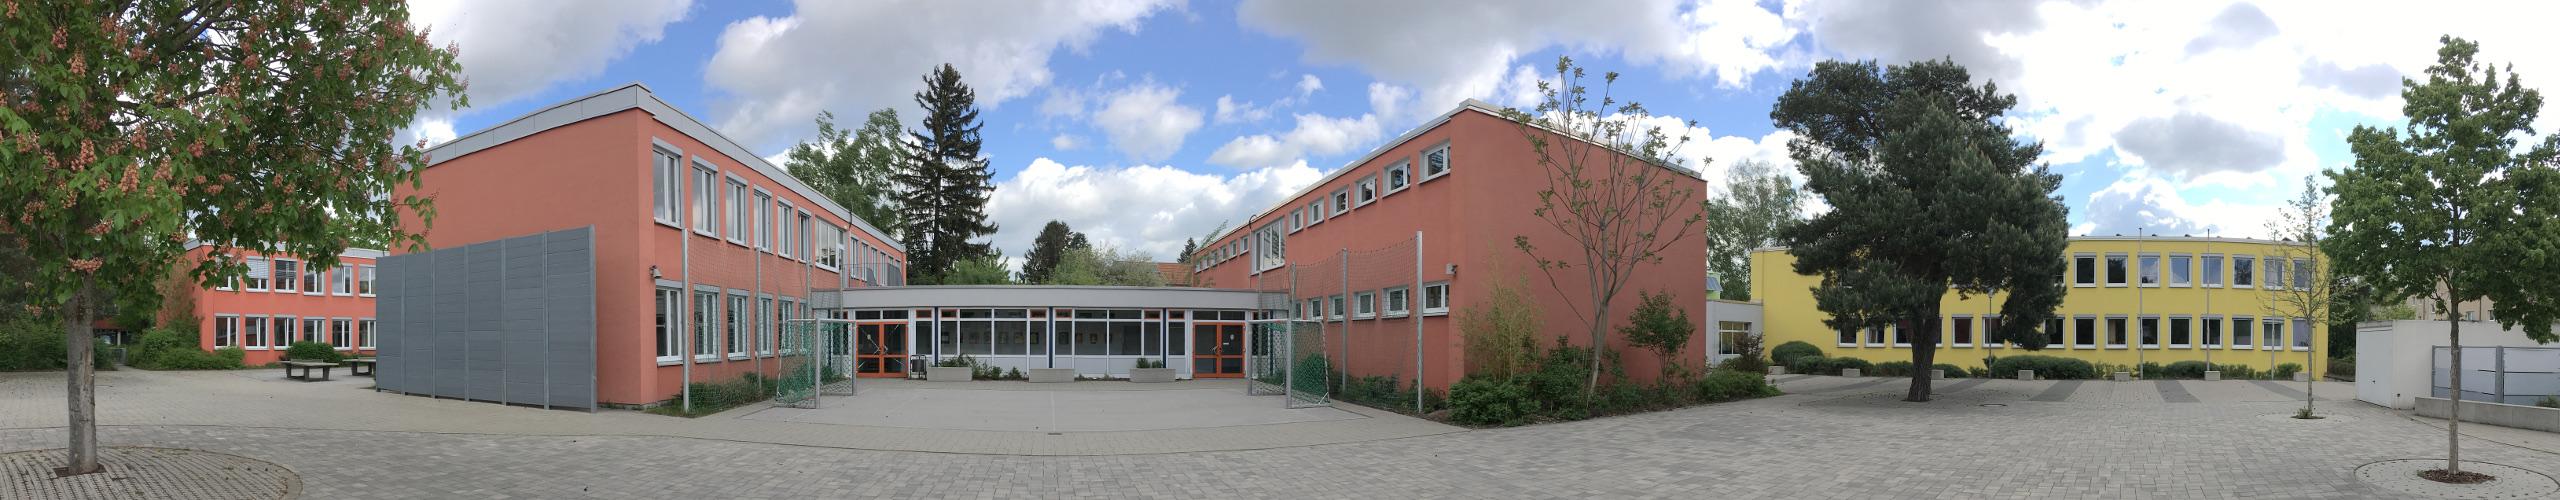 Otfried-Preußler-Schule Erlangen